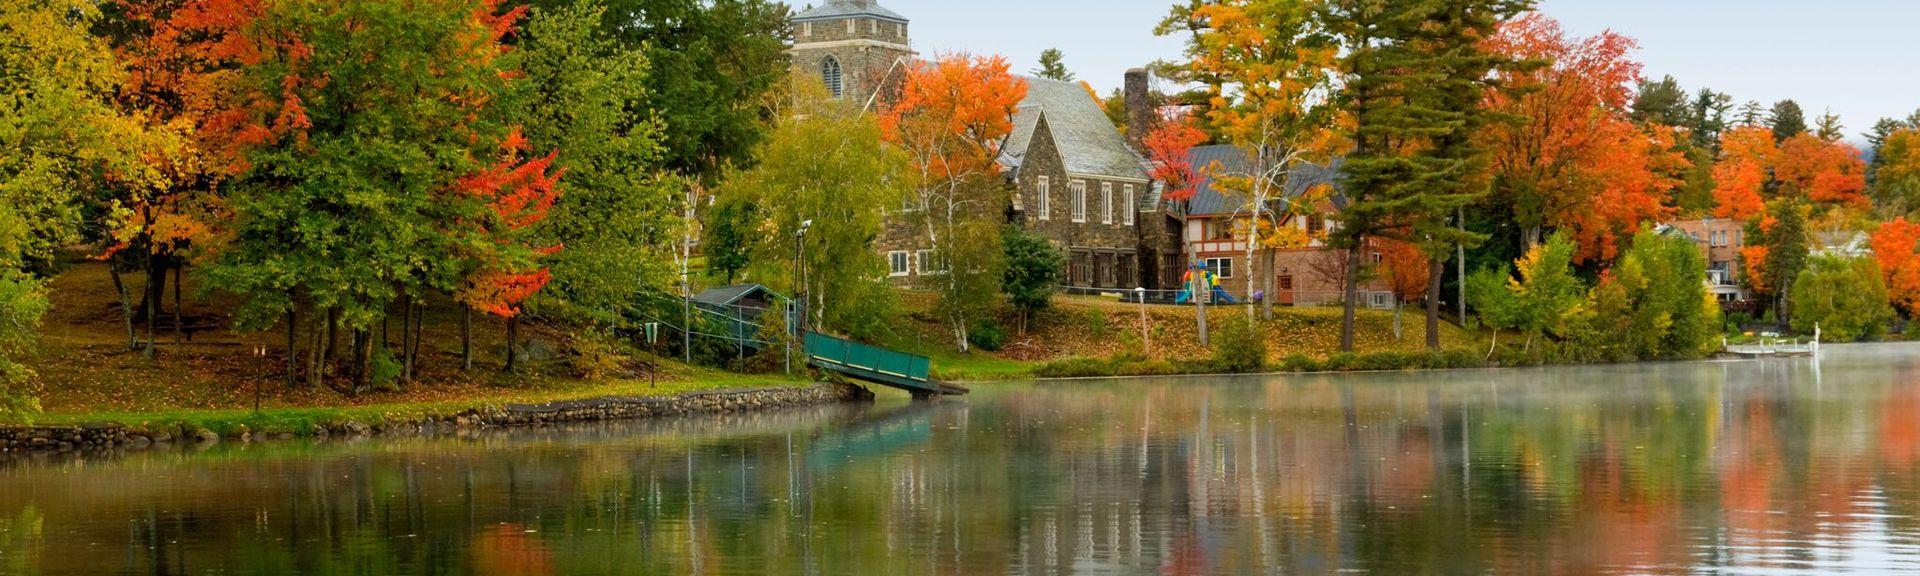 Lake Placid, New York, Vereinigte Staaten